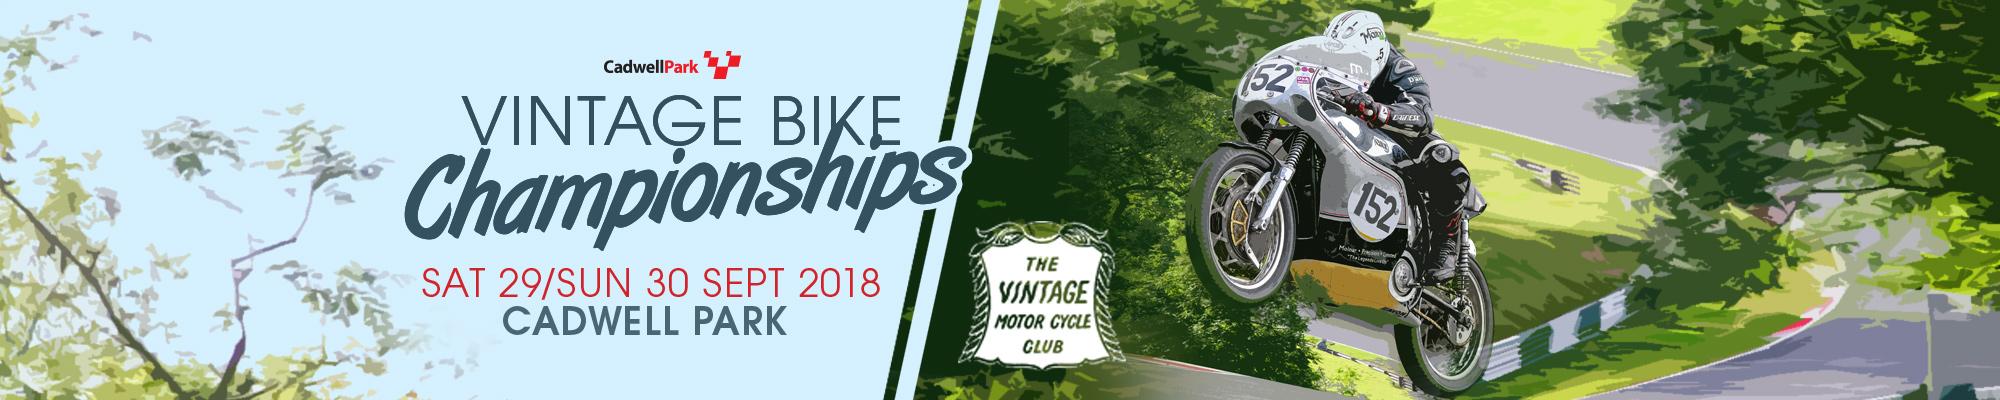 VMCC Vintage Bike Championships